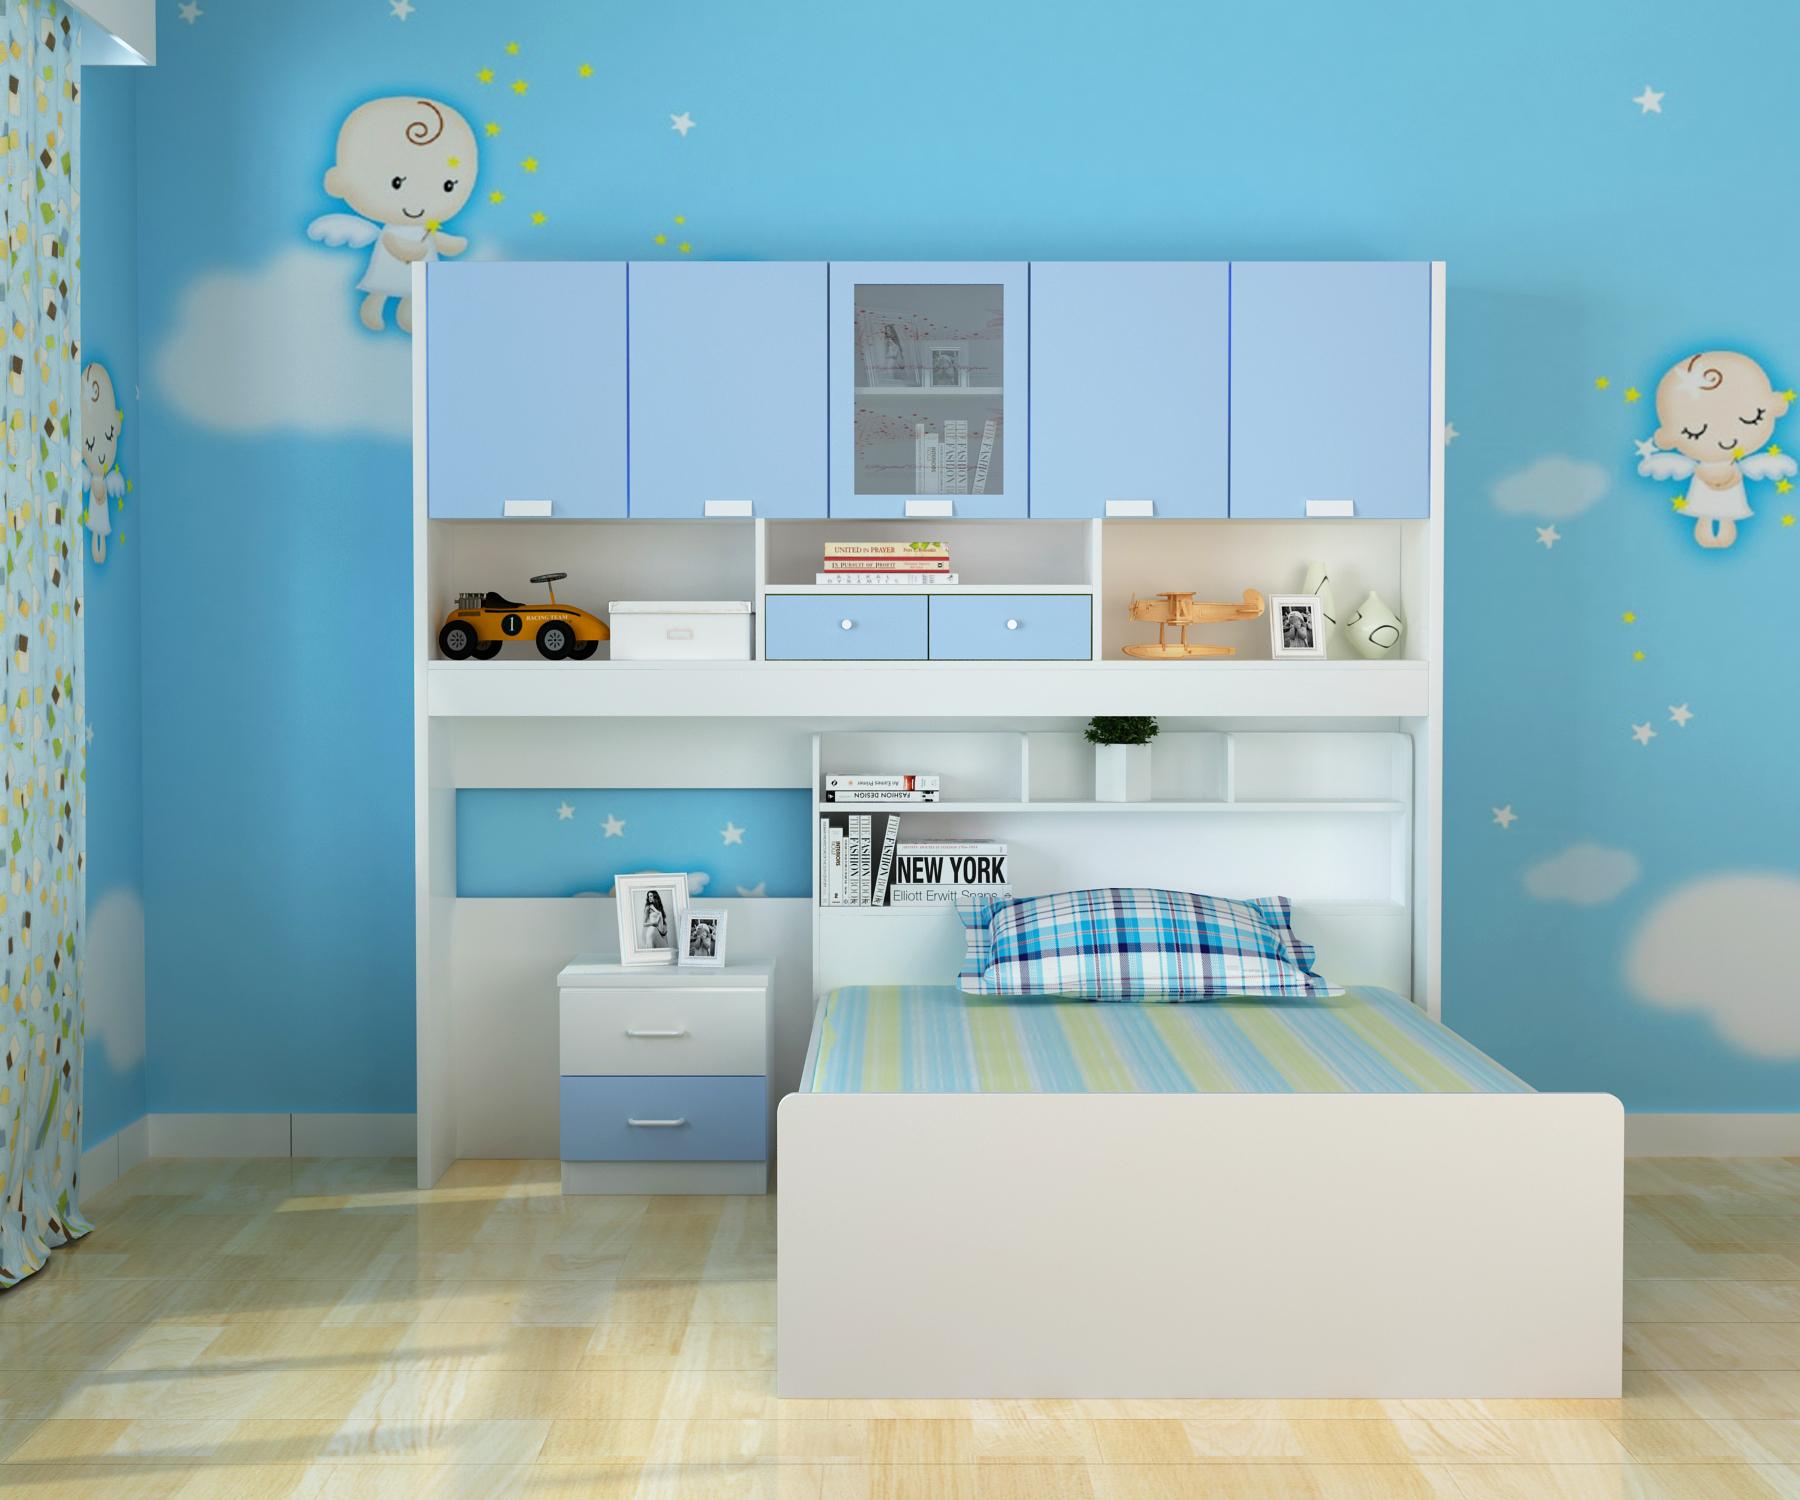 Förderung der Kinder neUe doppel - Bett der Mutter im Bett Bett multifunktions - schrank, Bett MIT bücherregal aus dem Bett kombiniert.